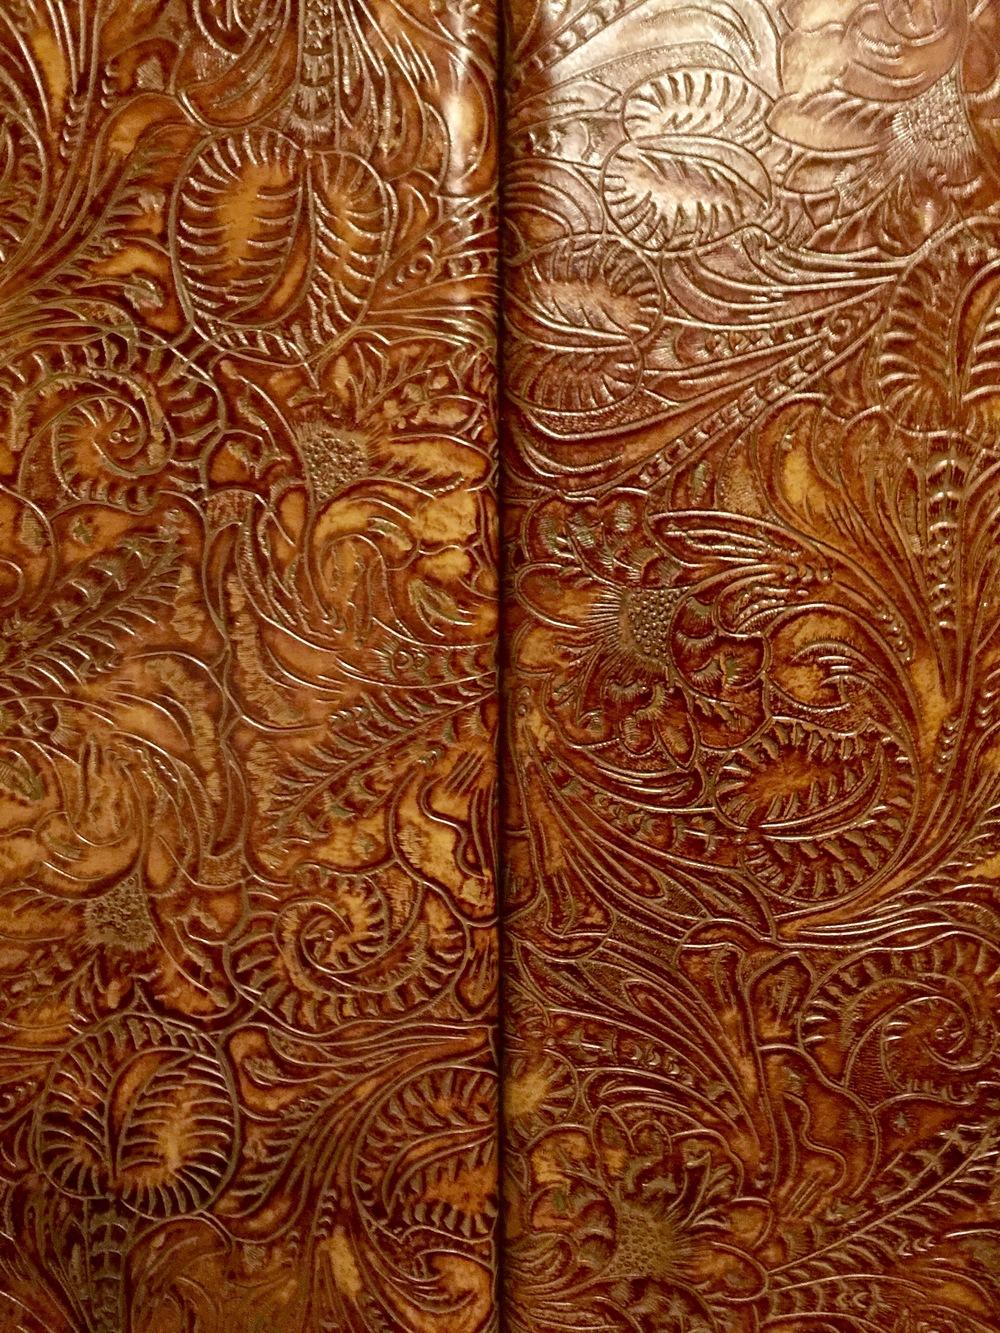 Tooled leather panels - Hotel Emma elevator cab